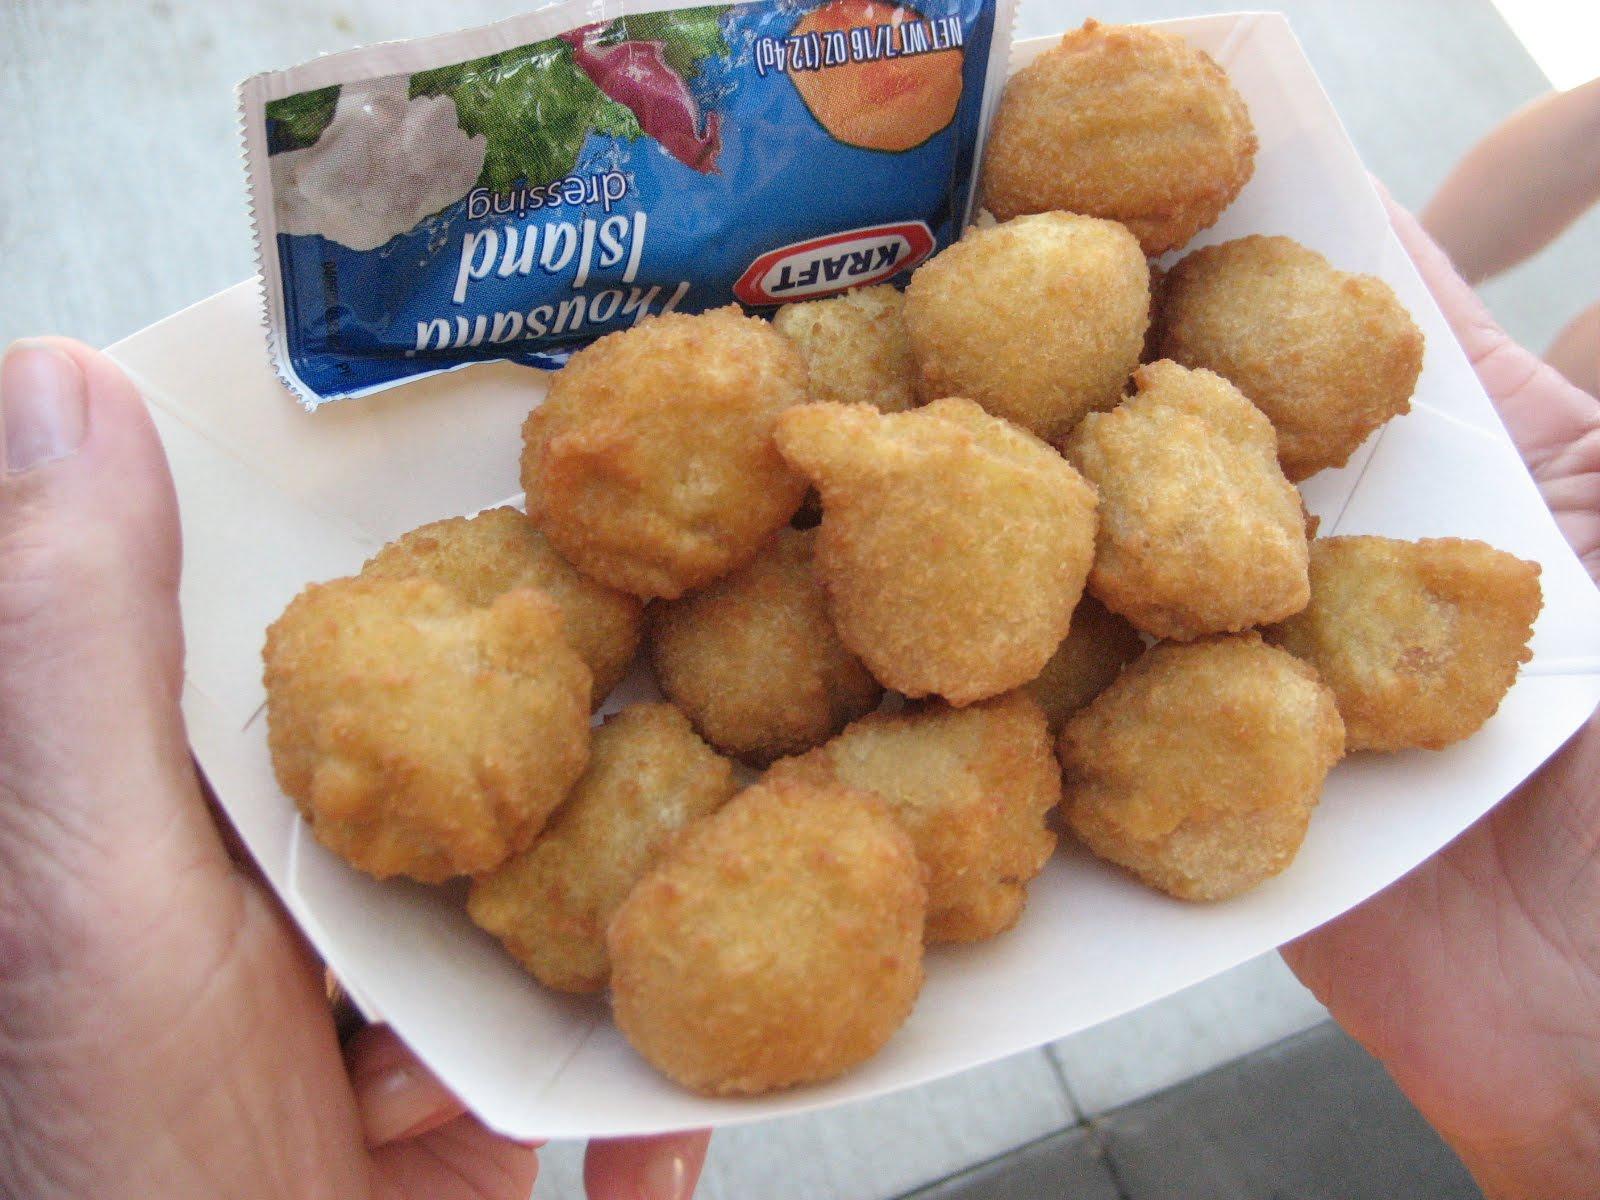 Image Result For Twister Potato